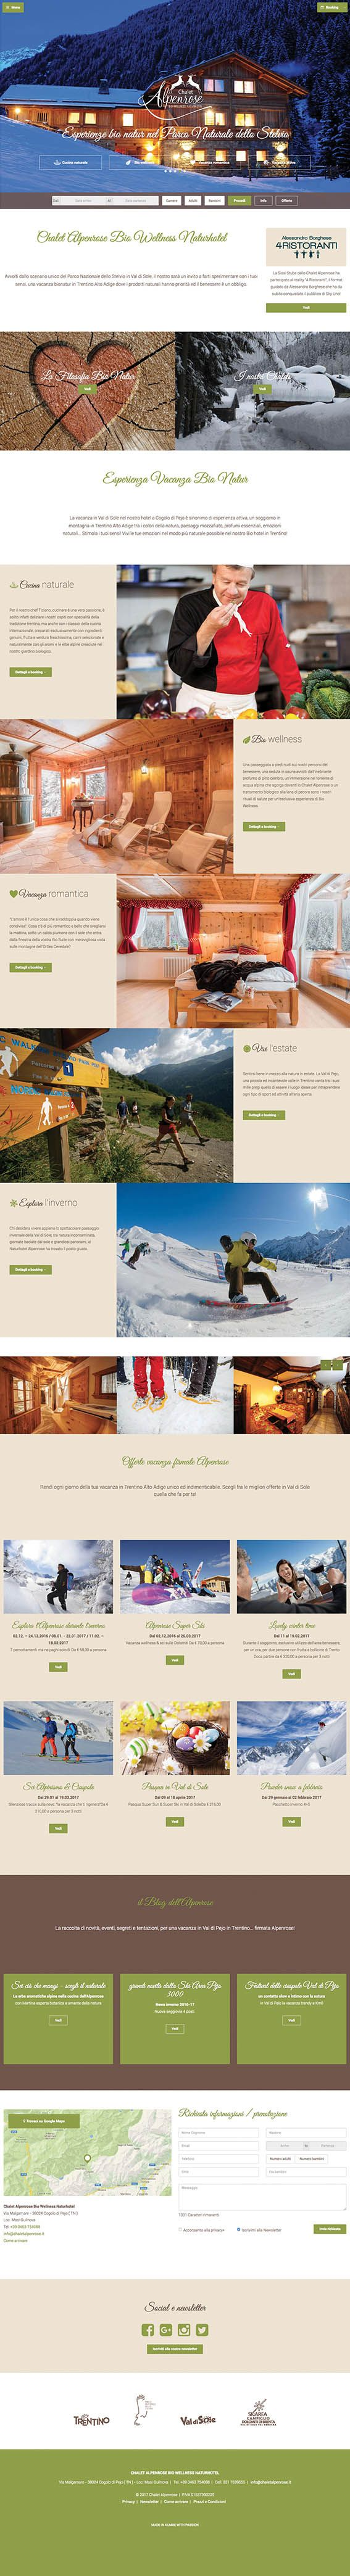 #chaletalpenrose www.chaletalpenrose.it #Kumbe #portfolioweb #webdesign #website #responsivedesign #responsive #bio #wellness #natur #biowellnessnaturhotel #chalet #parconazionaledellostelvio #valdisole #cogolo #pejo #trentino #trentinoaltoadige #wonter #inverno #estate #summer #ski #snow #bike #trekking #love #fun #family #holiday